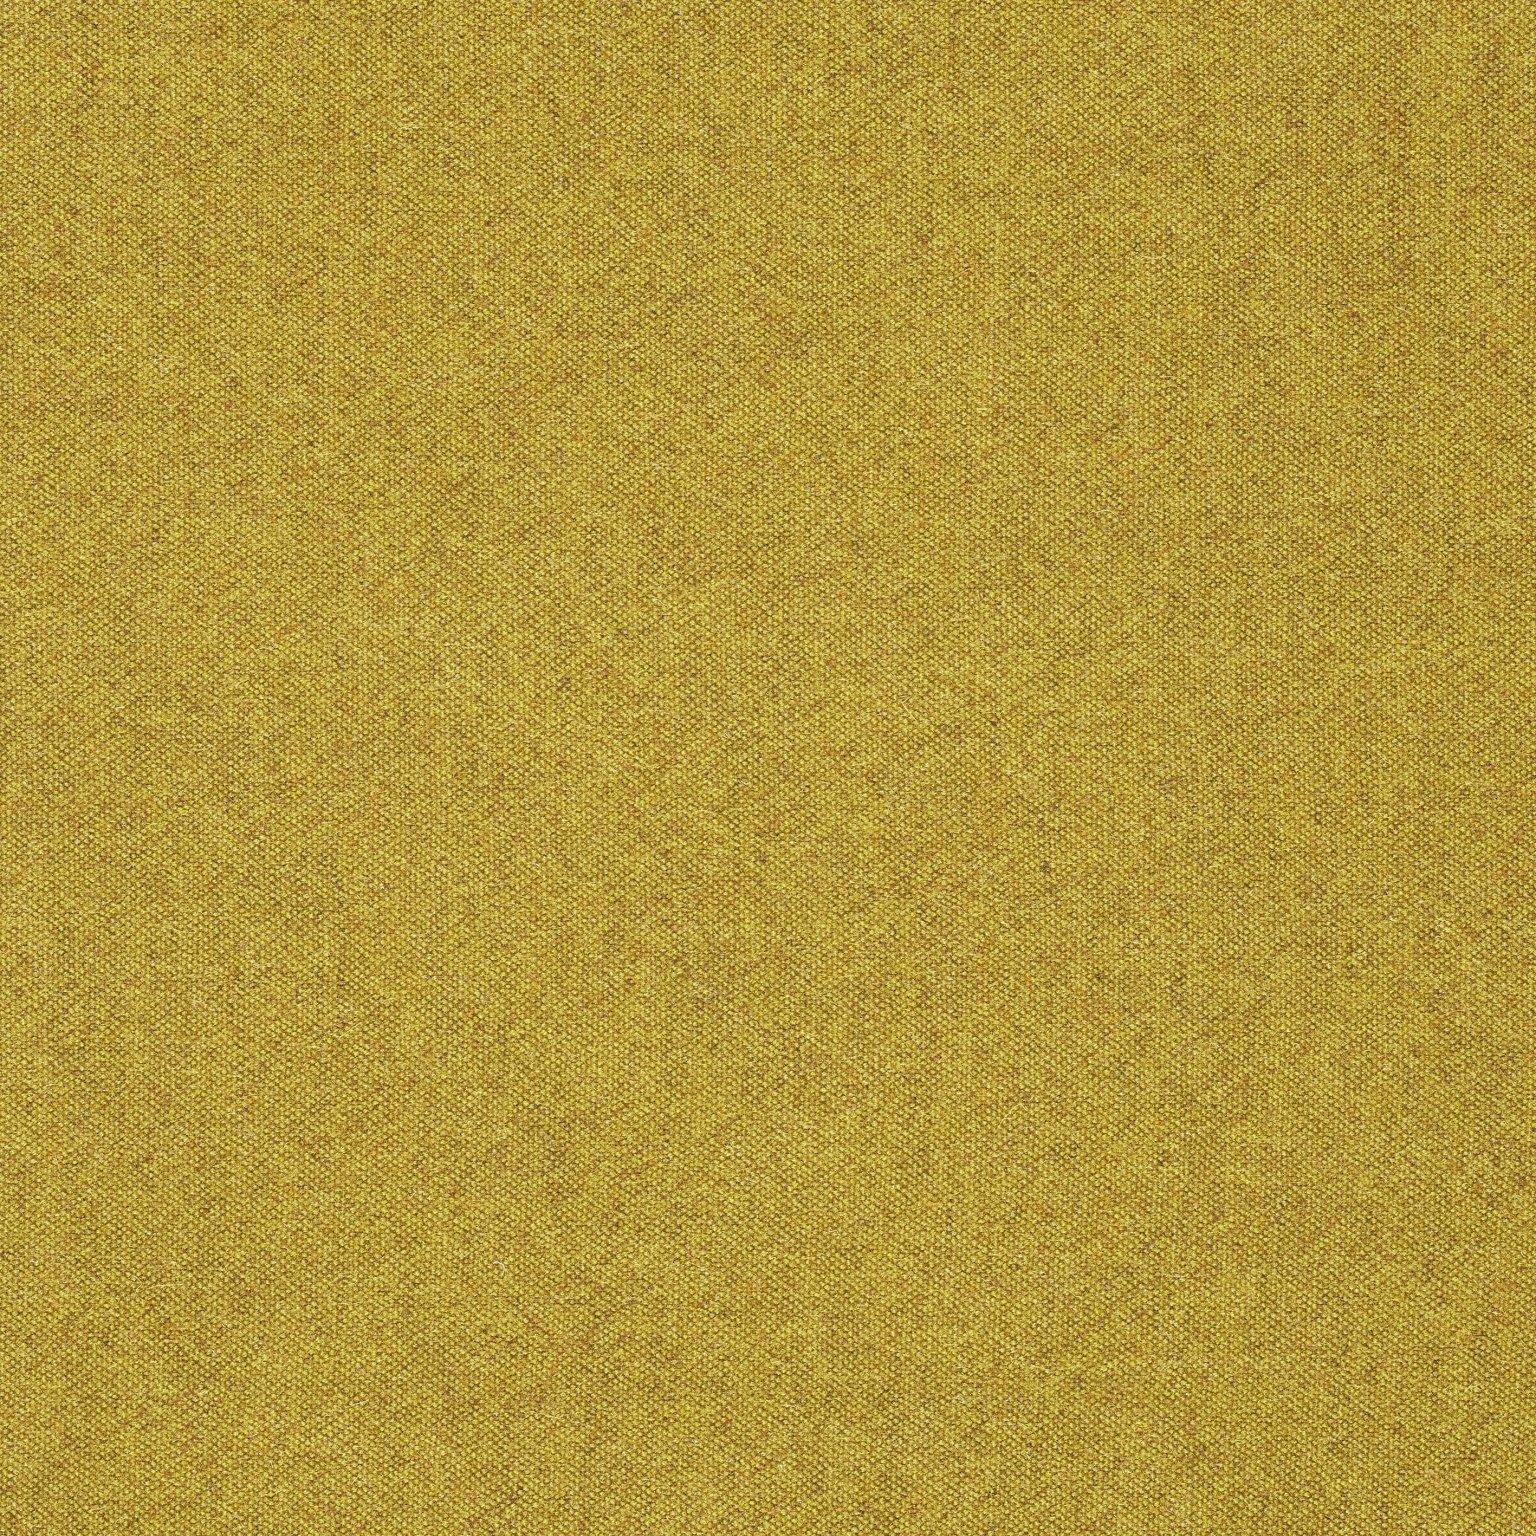 Kvadrat > Melange Nap 0441